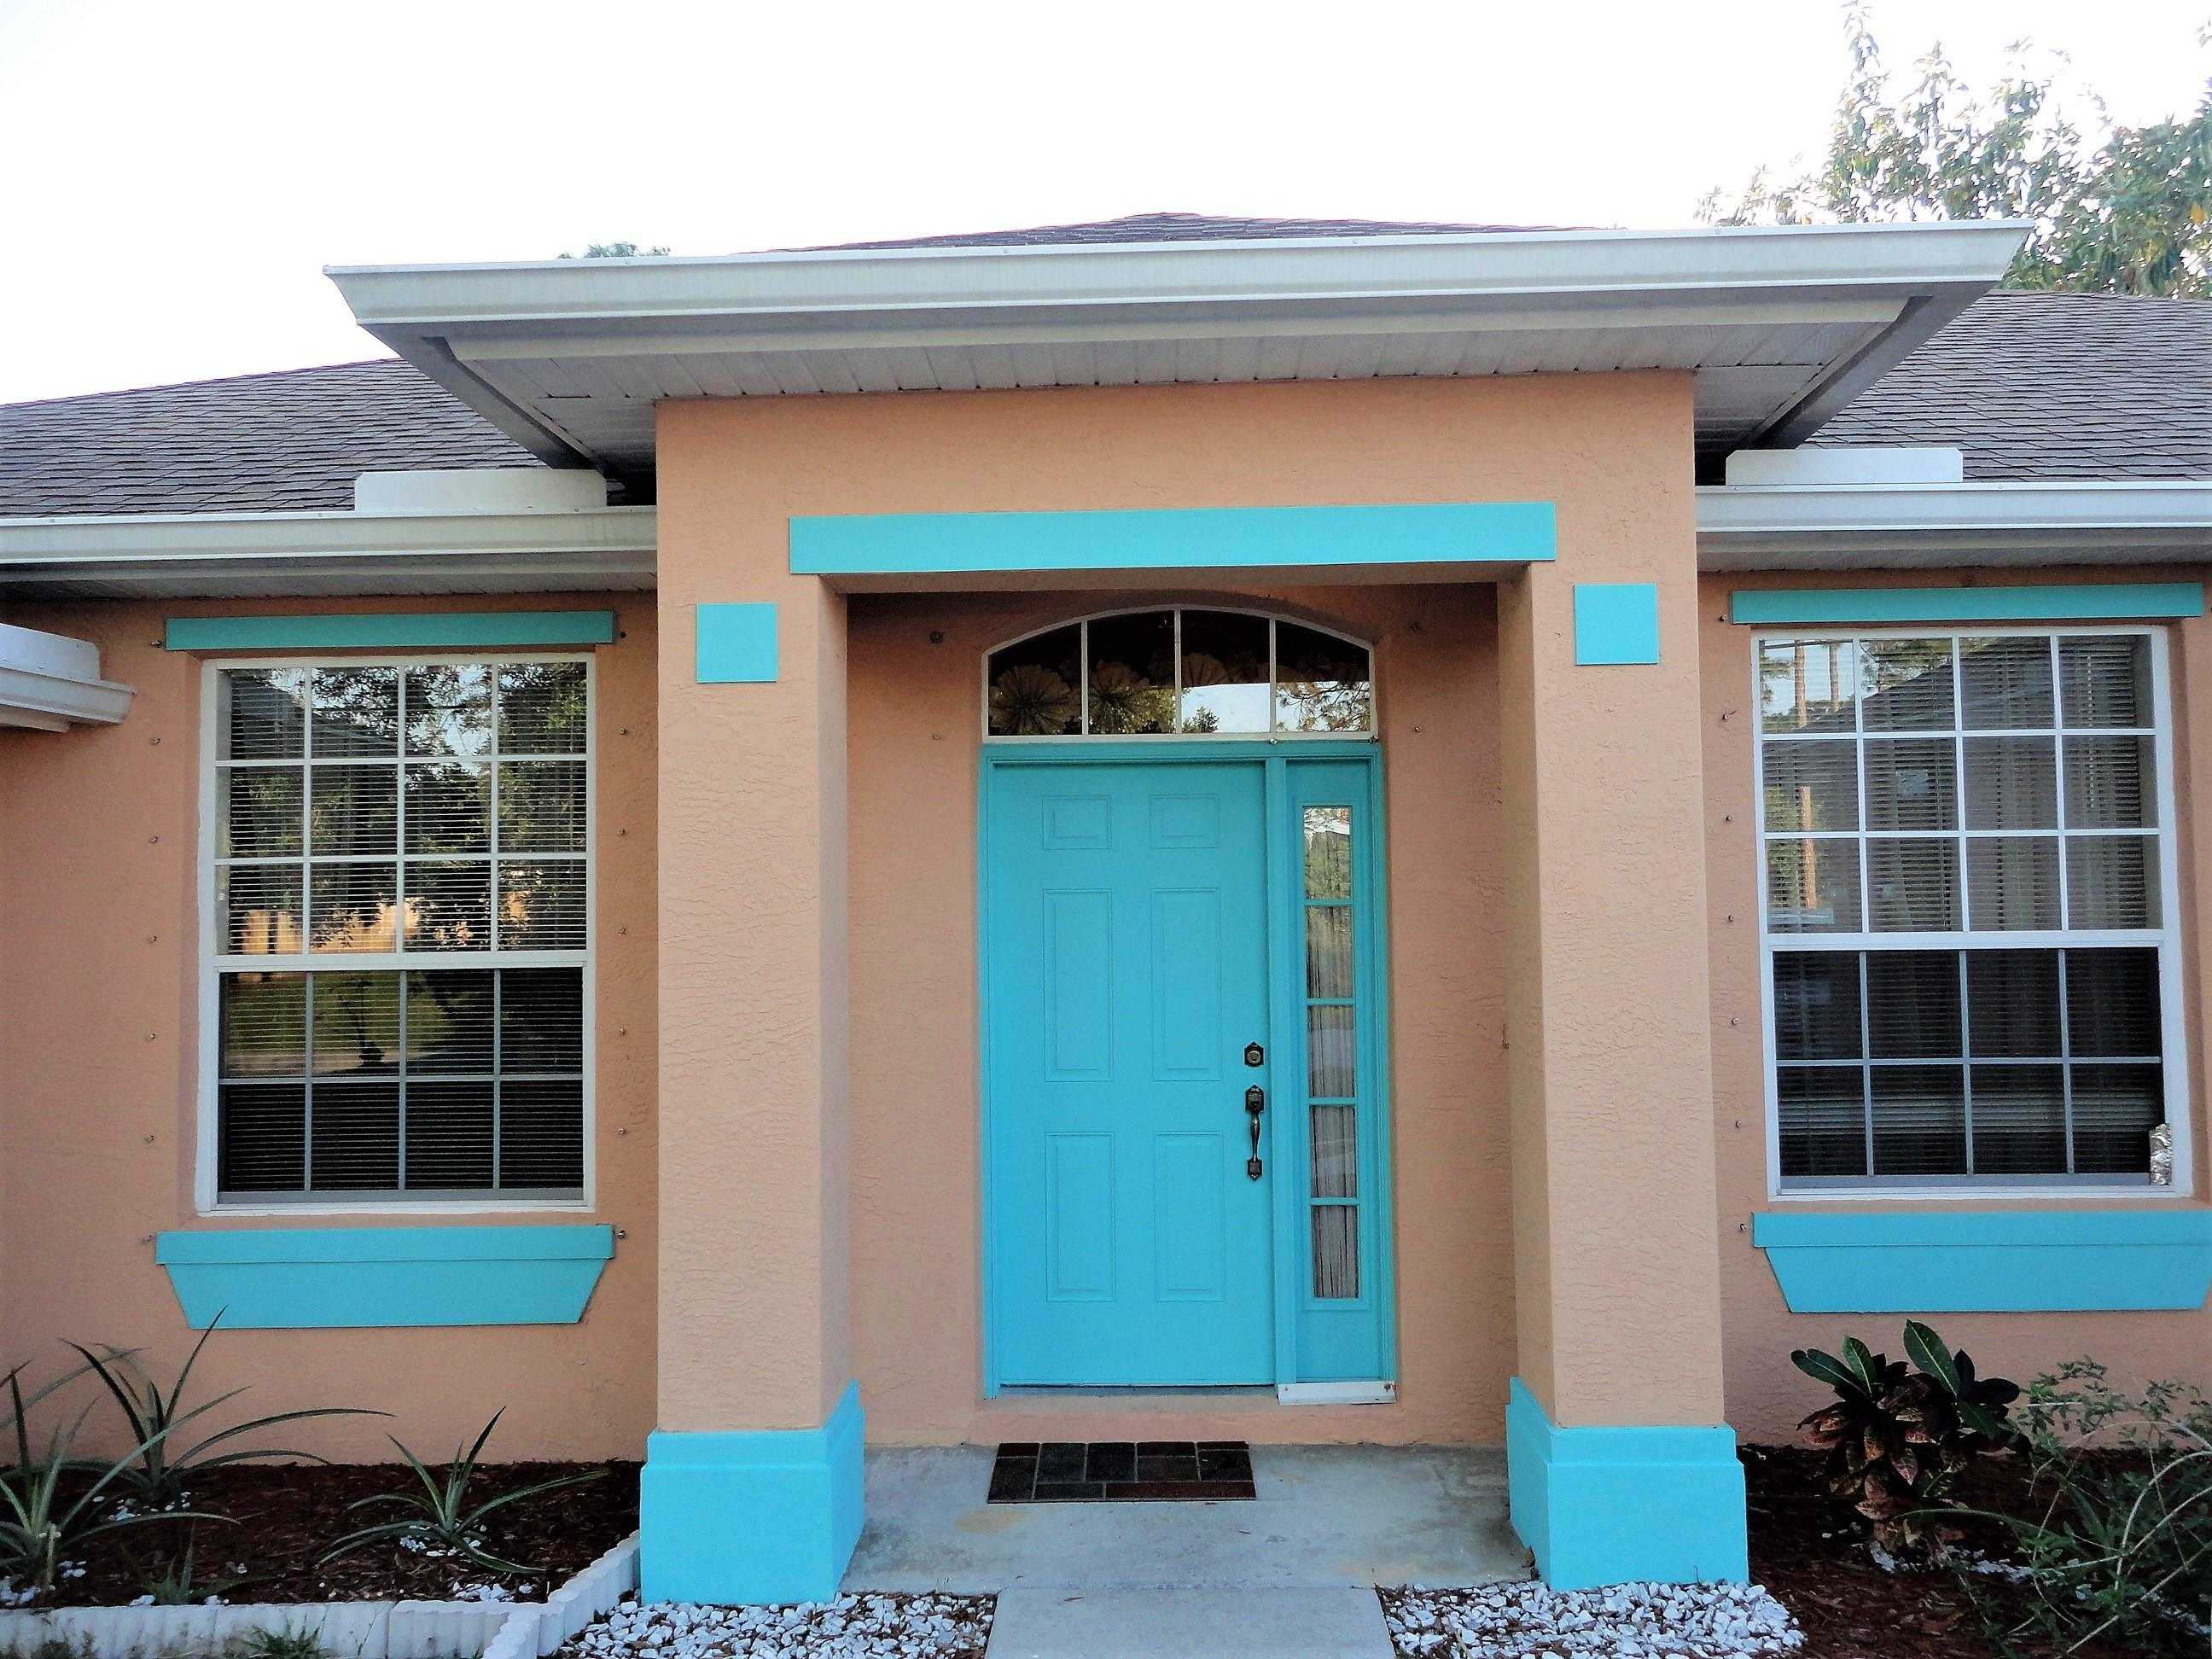 1772 Southeast Fallon Drive - Port St Lucie, Florida